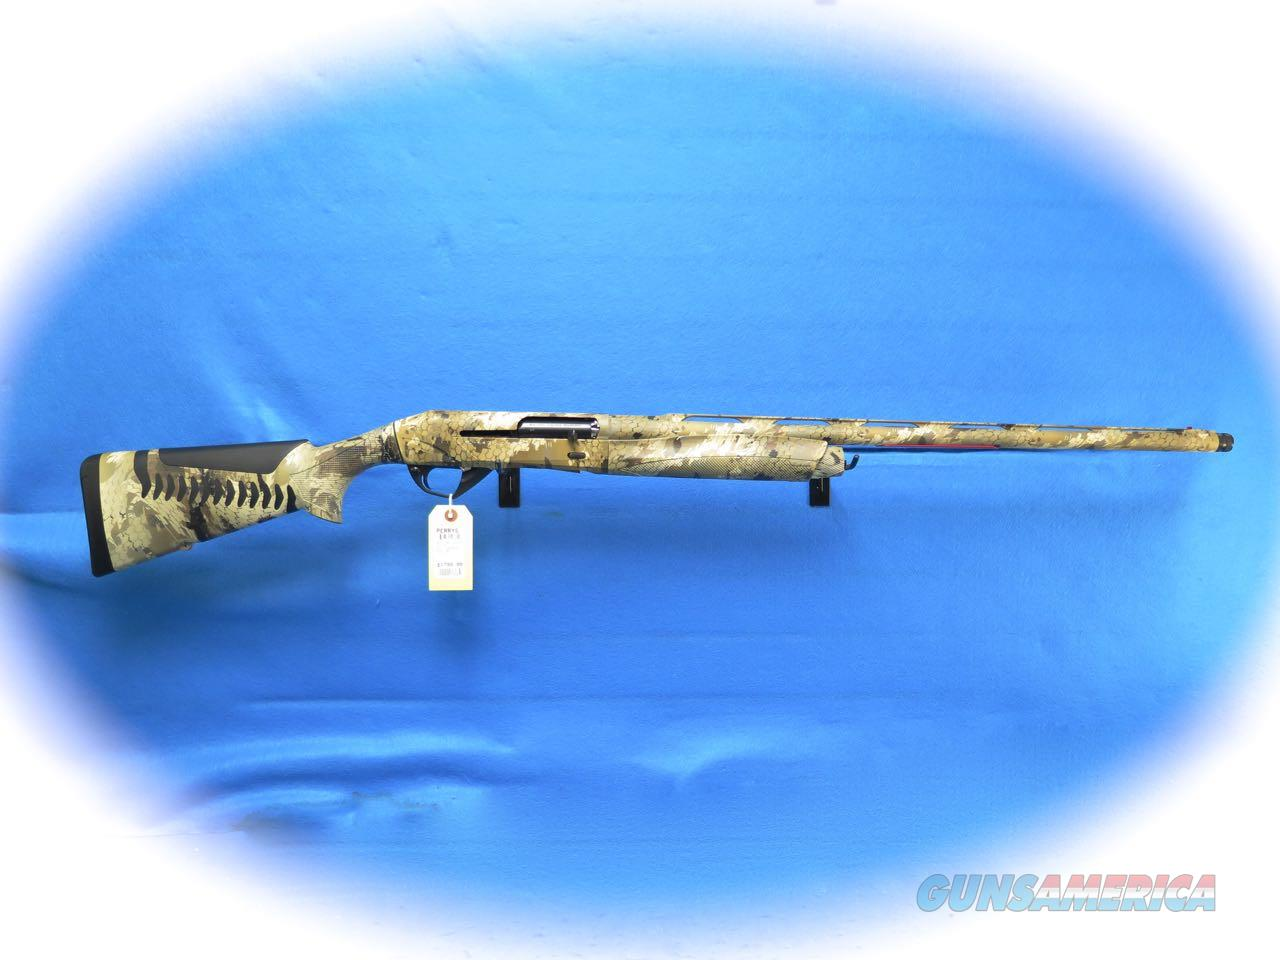 Benelli SBE3 12 Ga. Semi Auto Shotgun Model 10385 **New**  Guns > Shotguns > Benelli Shotguns > Sporting